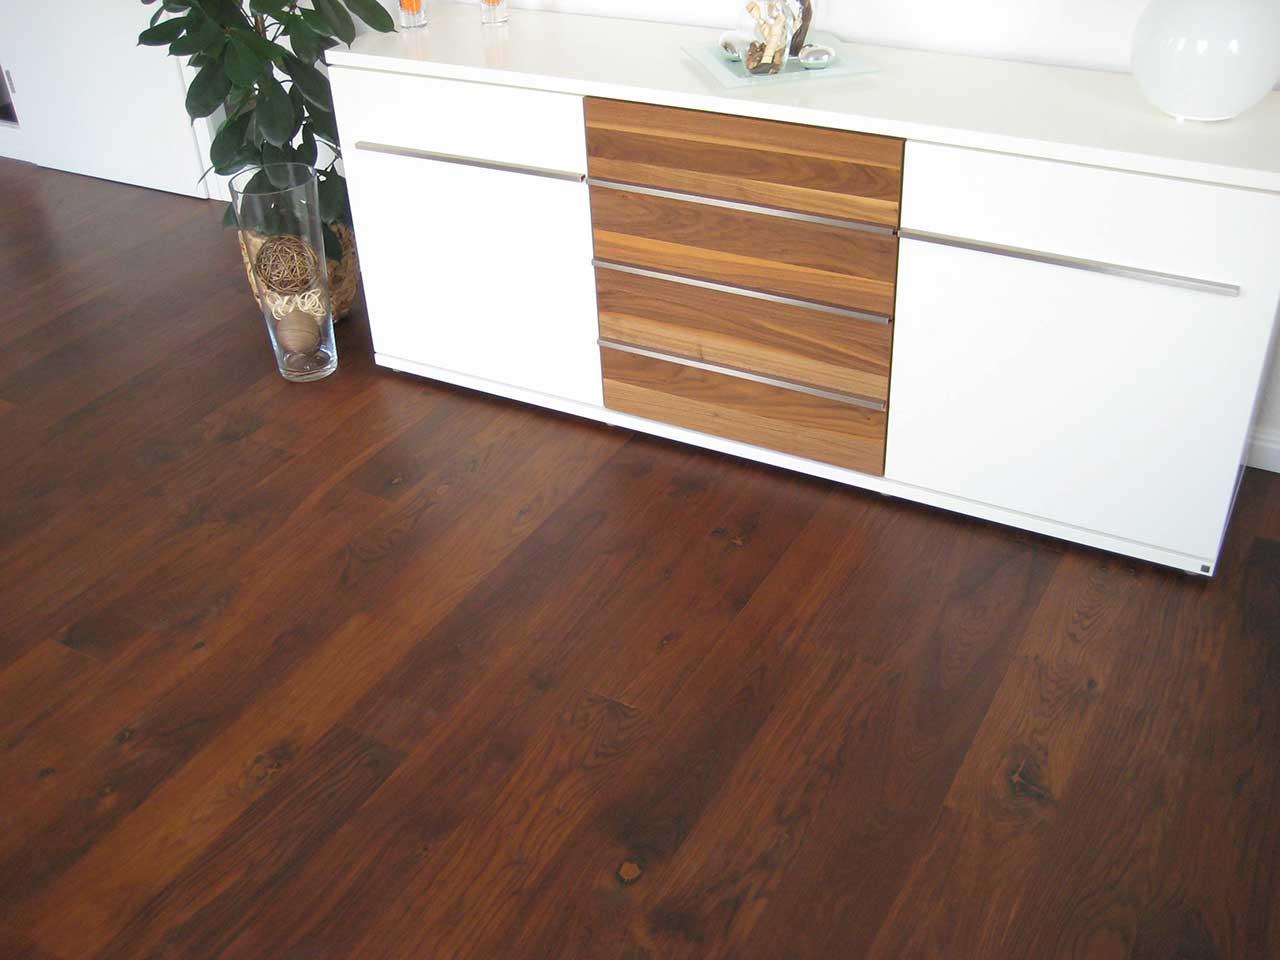 dielenboden ge lt rozyn parkettb den. Black Bedroom Furniture Sets. Home Design Ideas